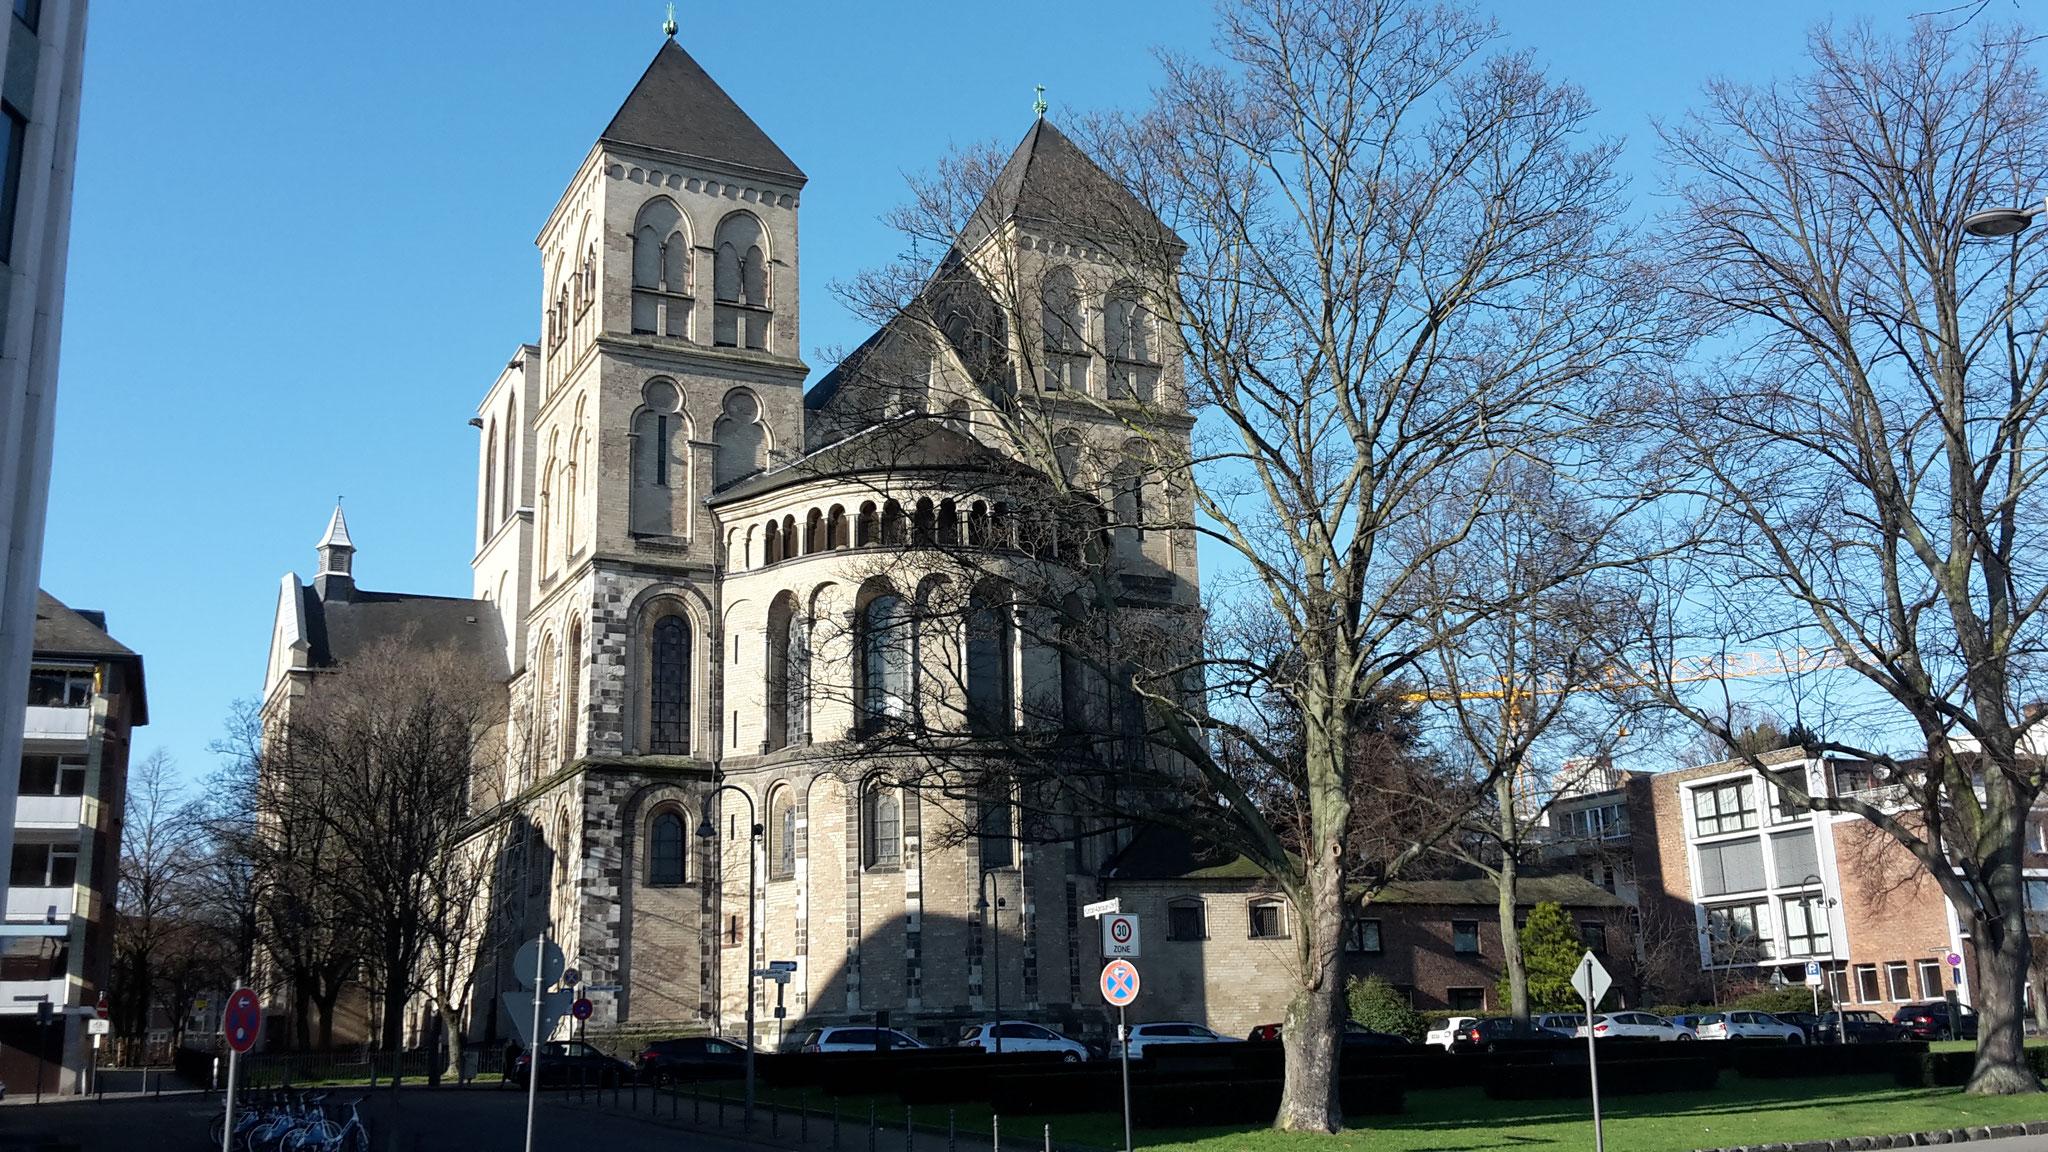 Führung Romanische Kirchen - St. Kunibert am Rhein (nahe Breslauer Platz)